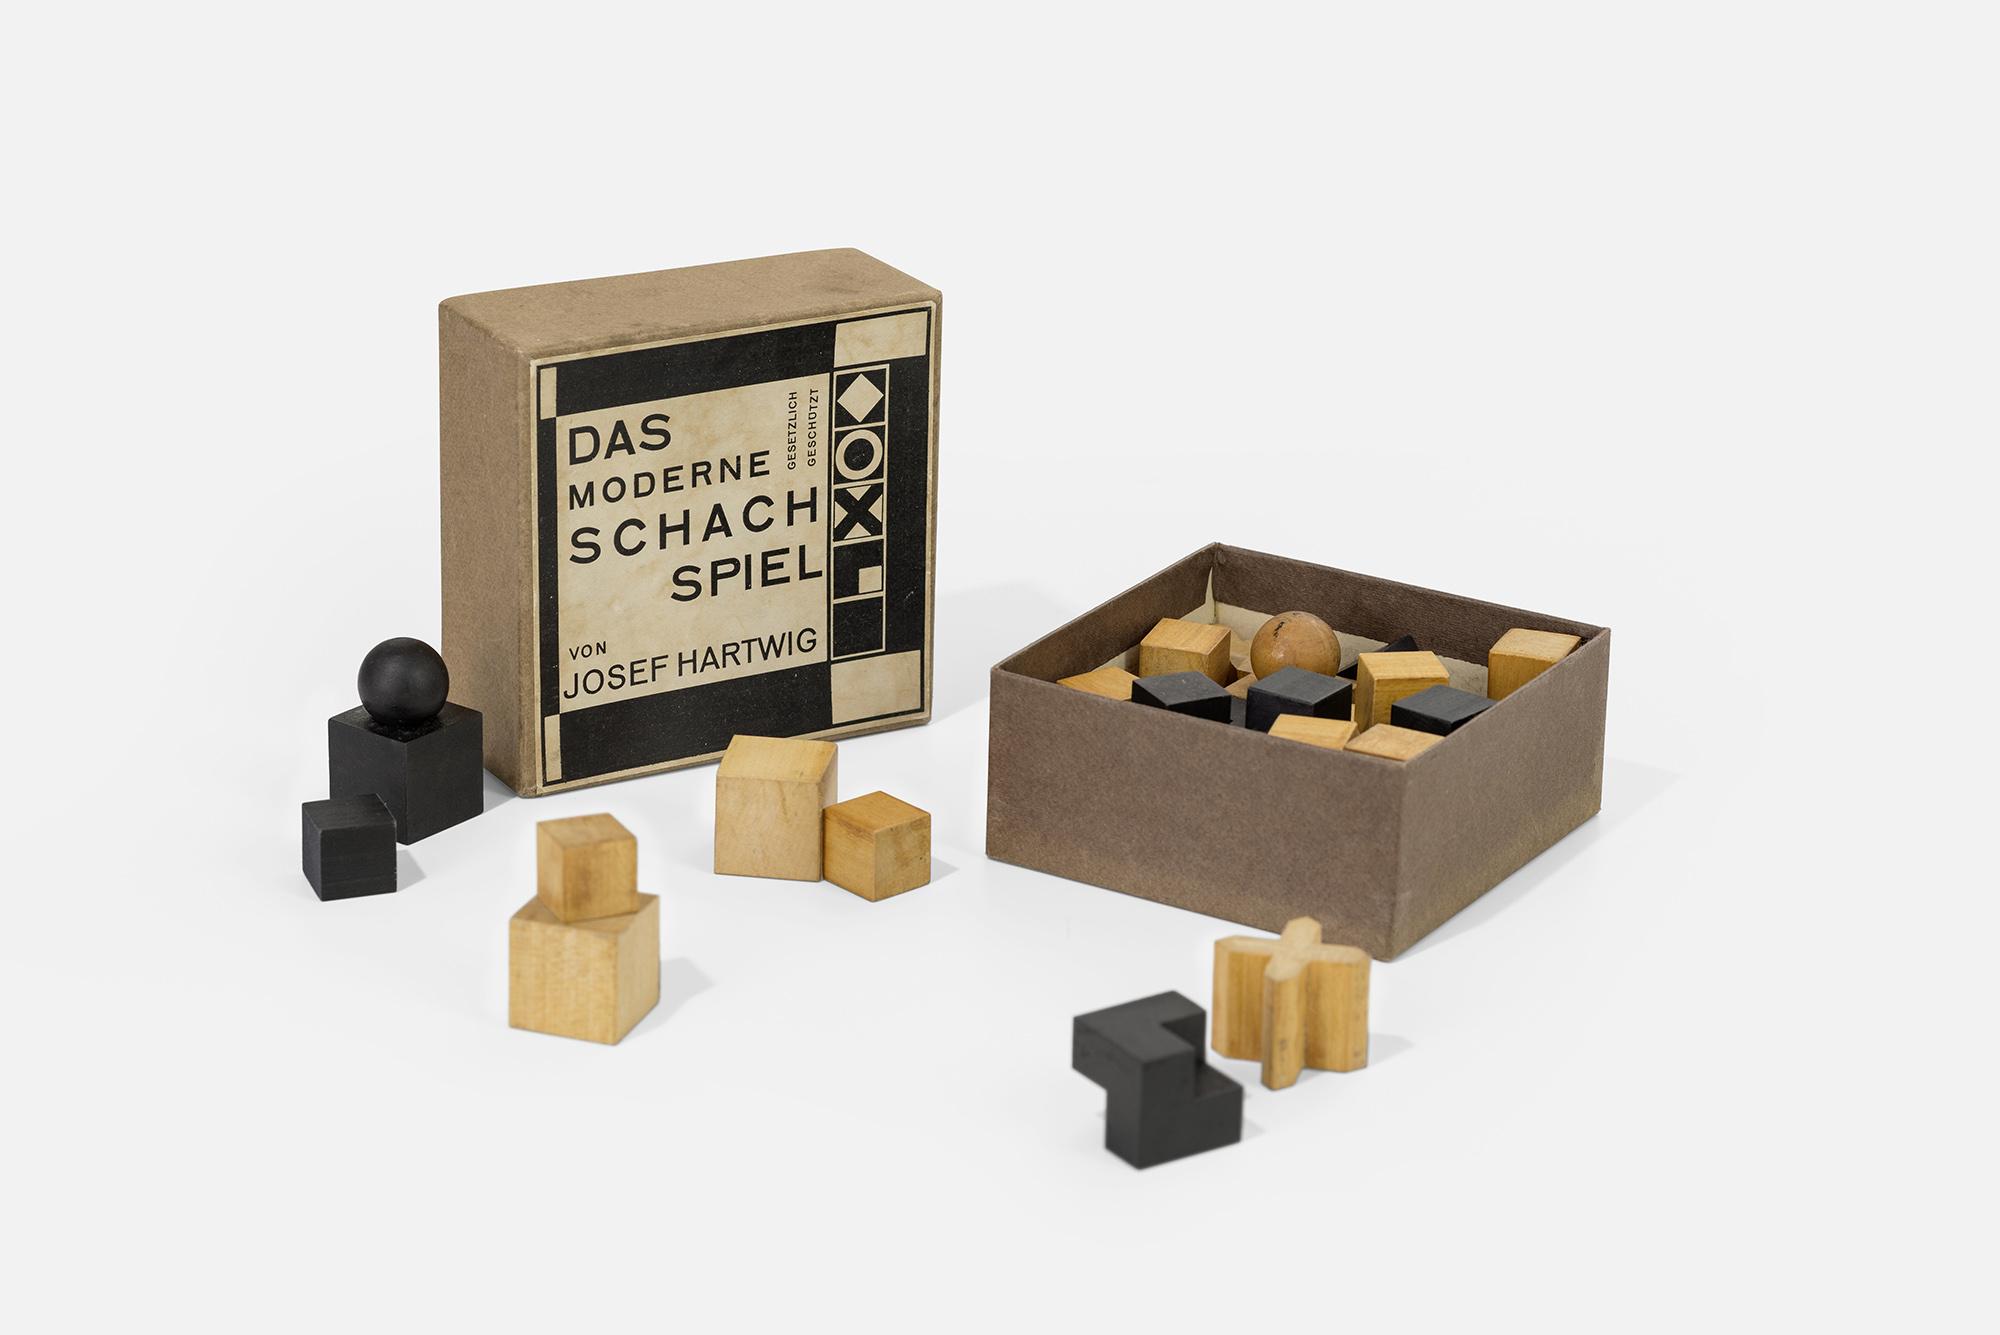 International Exhibit Of Bauhaus School of Design Comes to Elmhurst | WBEZ